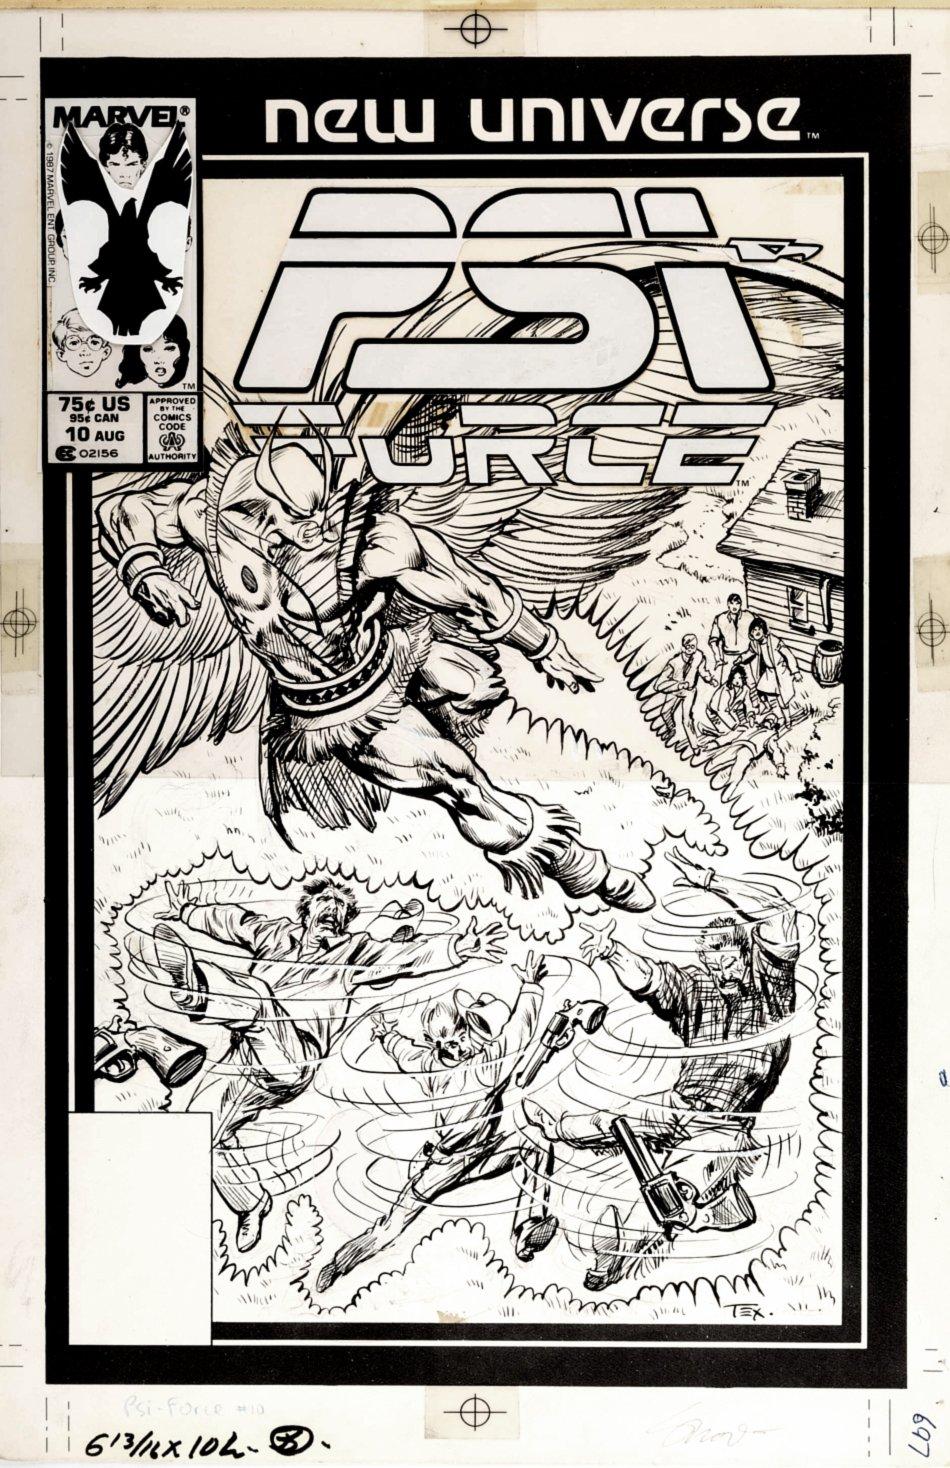 Psi-Force #10 Cover (Psi-Force Battling Psi-Hawk!) 1987